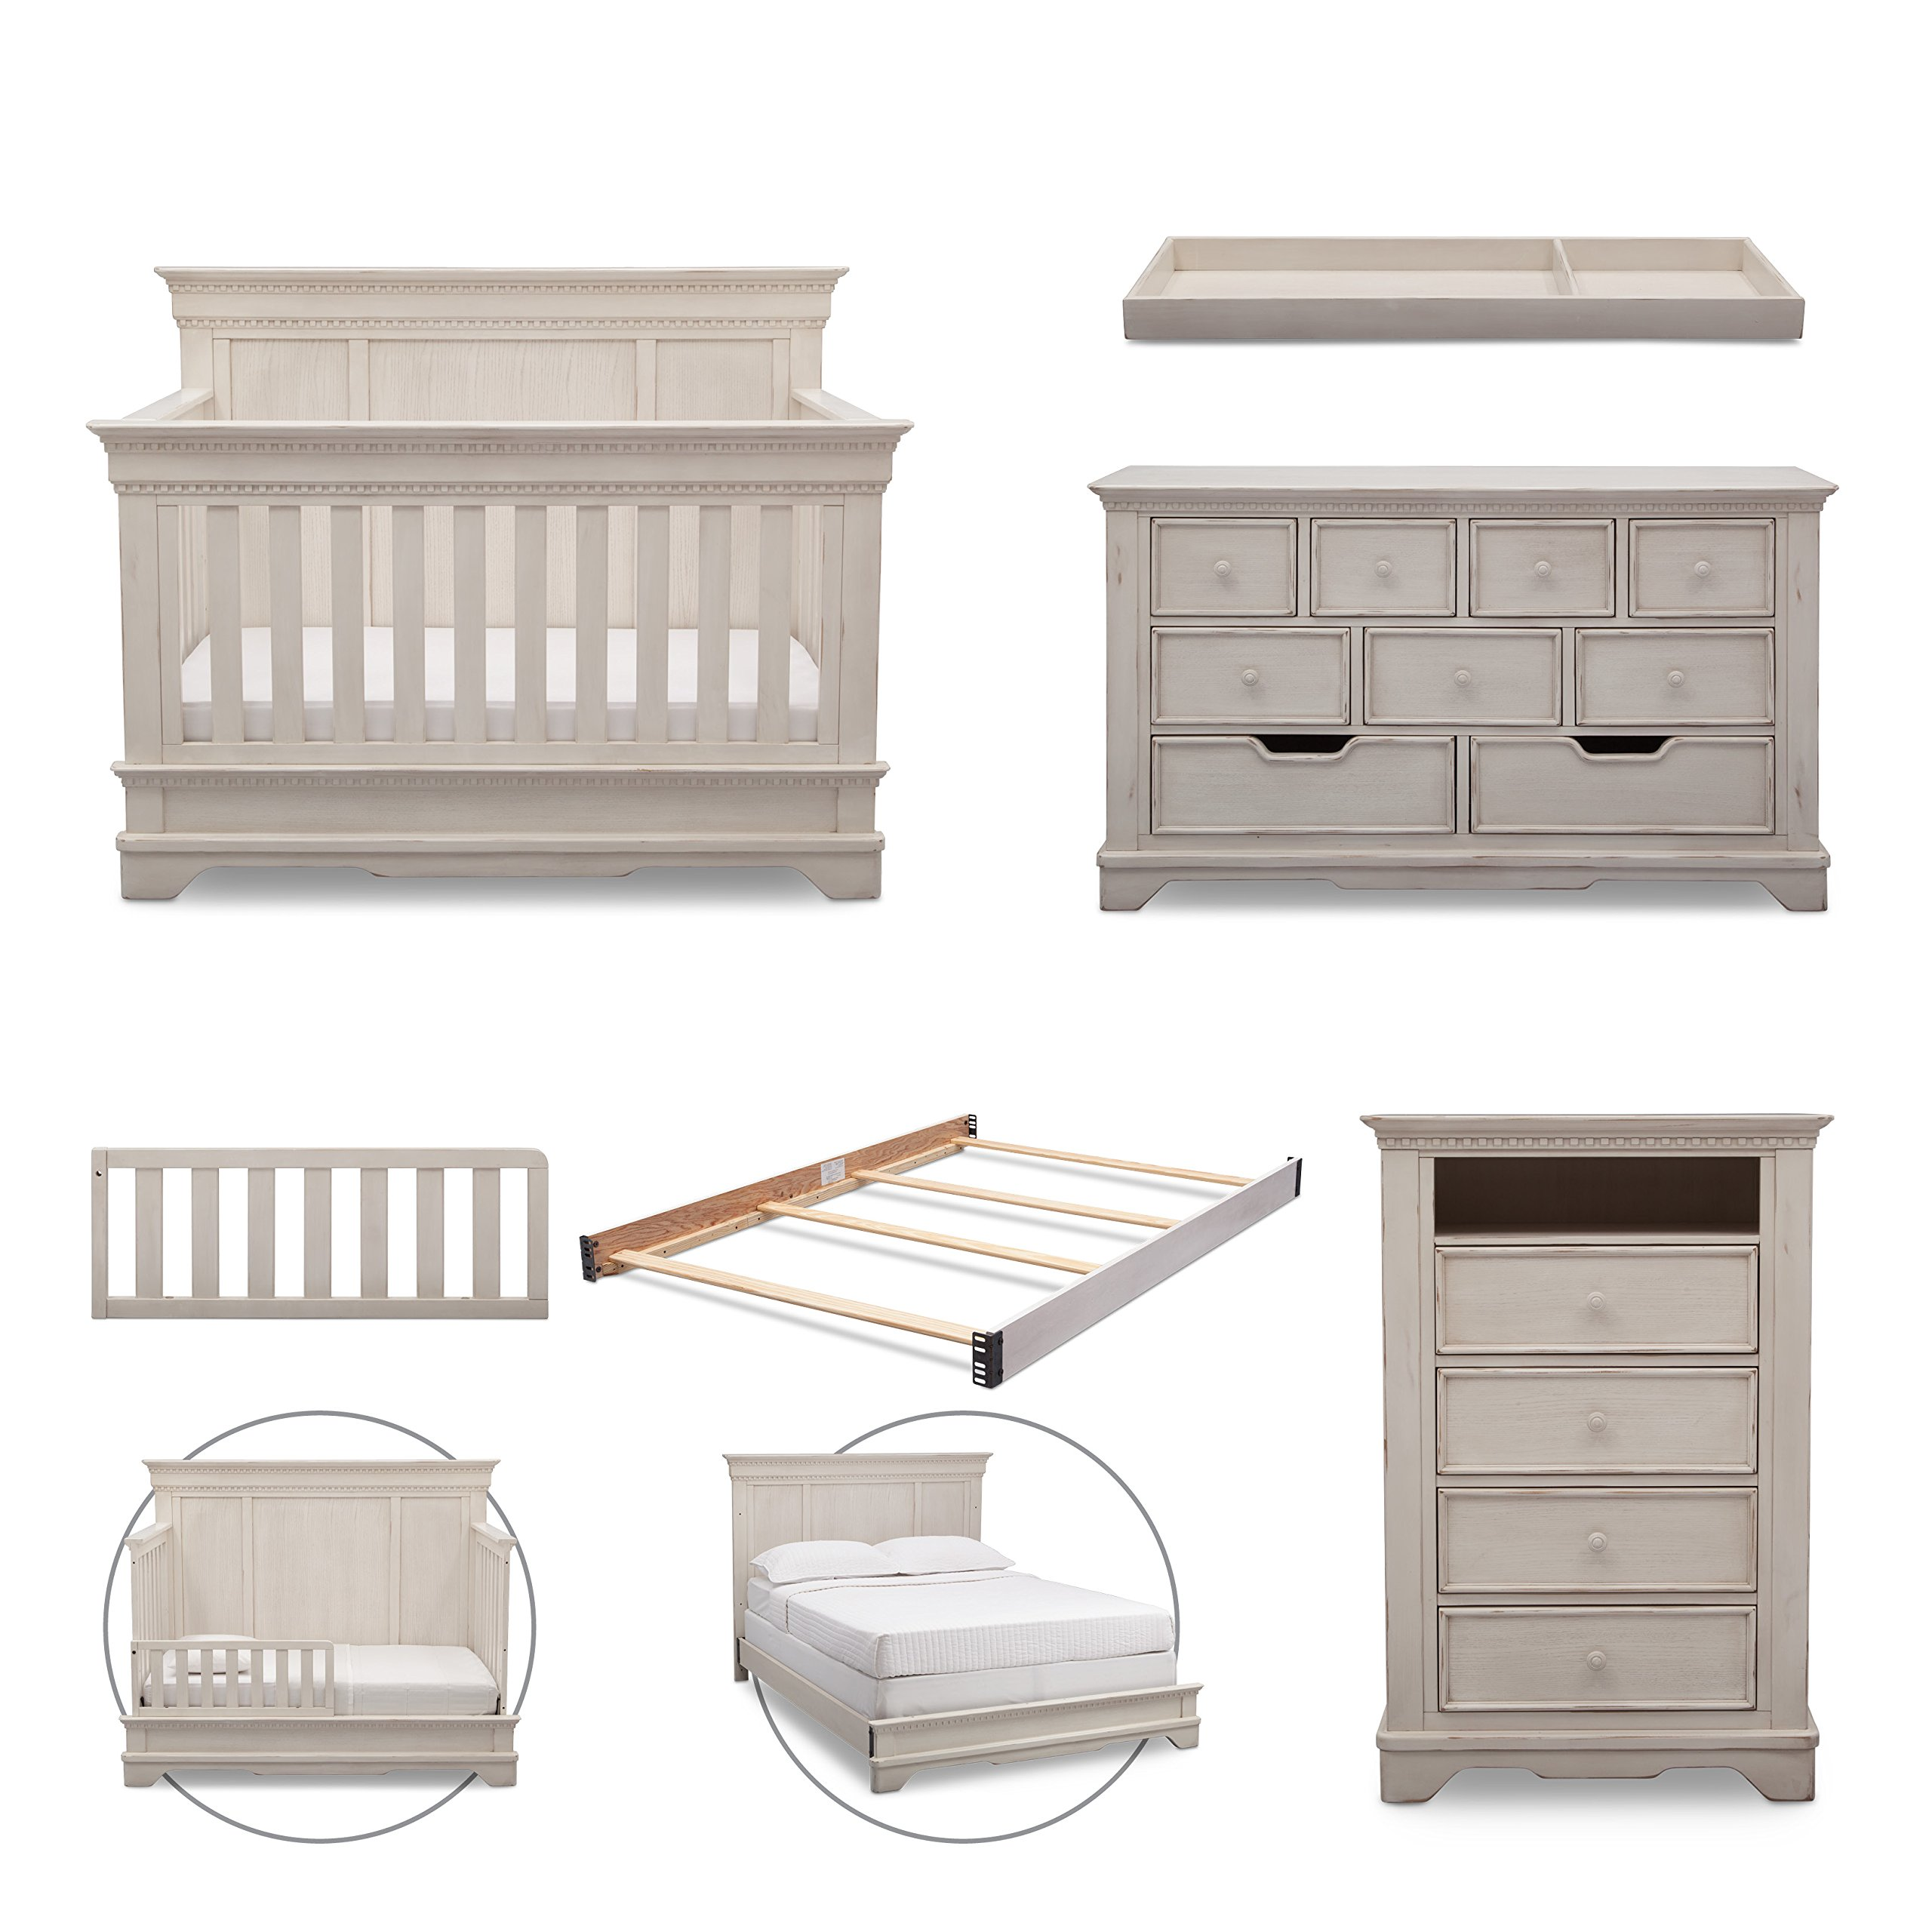 Simmons Kids Tivoli 6-Piece Nursery Furniture Set (Convertible Crib, Dresser, Chest, Changing Top, Toddler Guardrail, Full Size Conversion) | Antique White